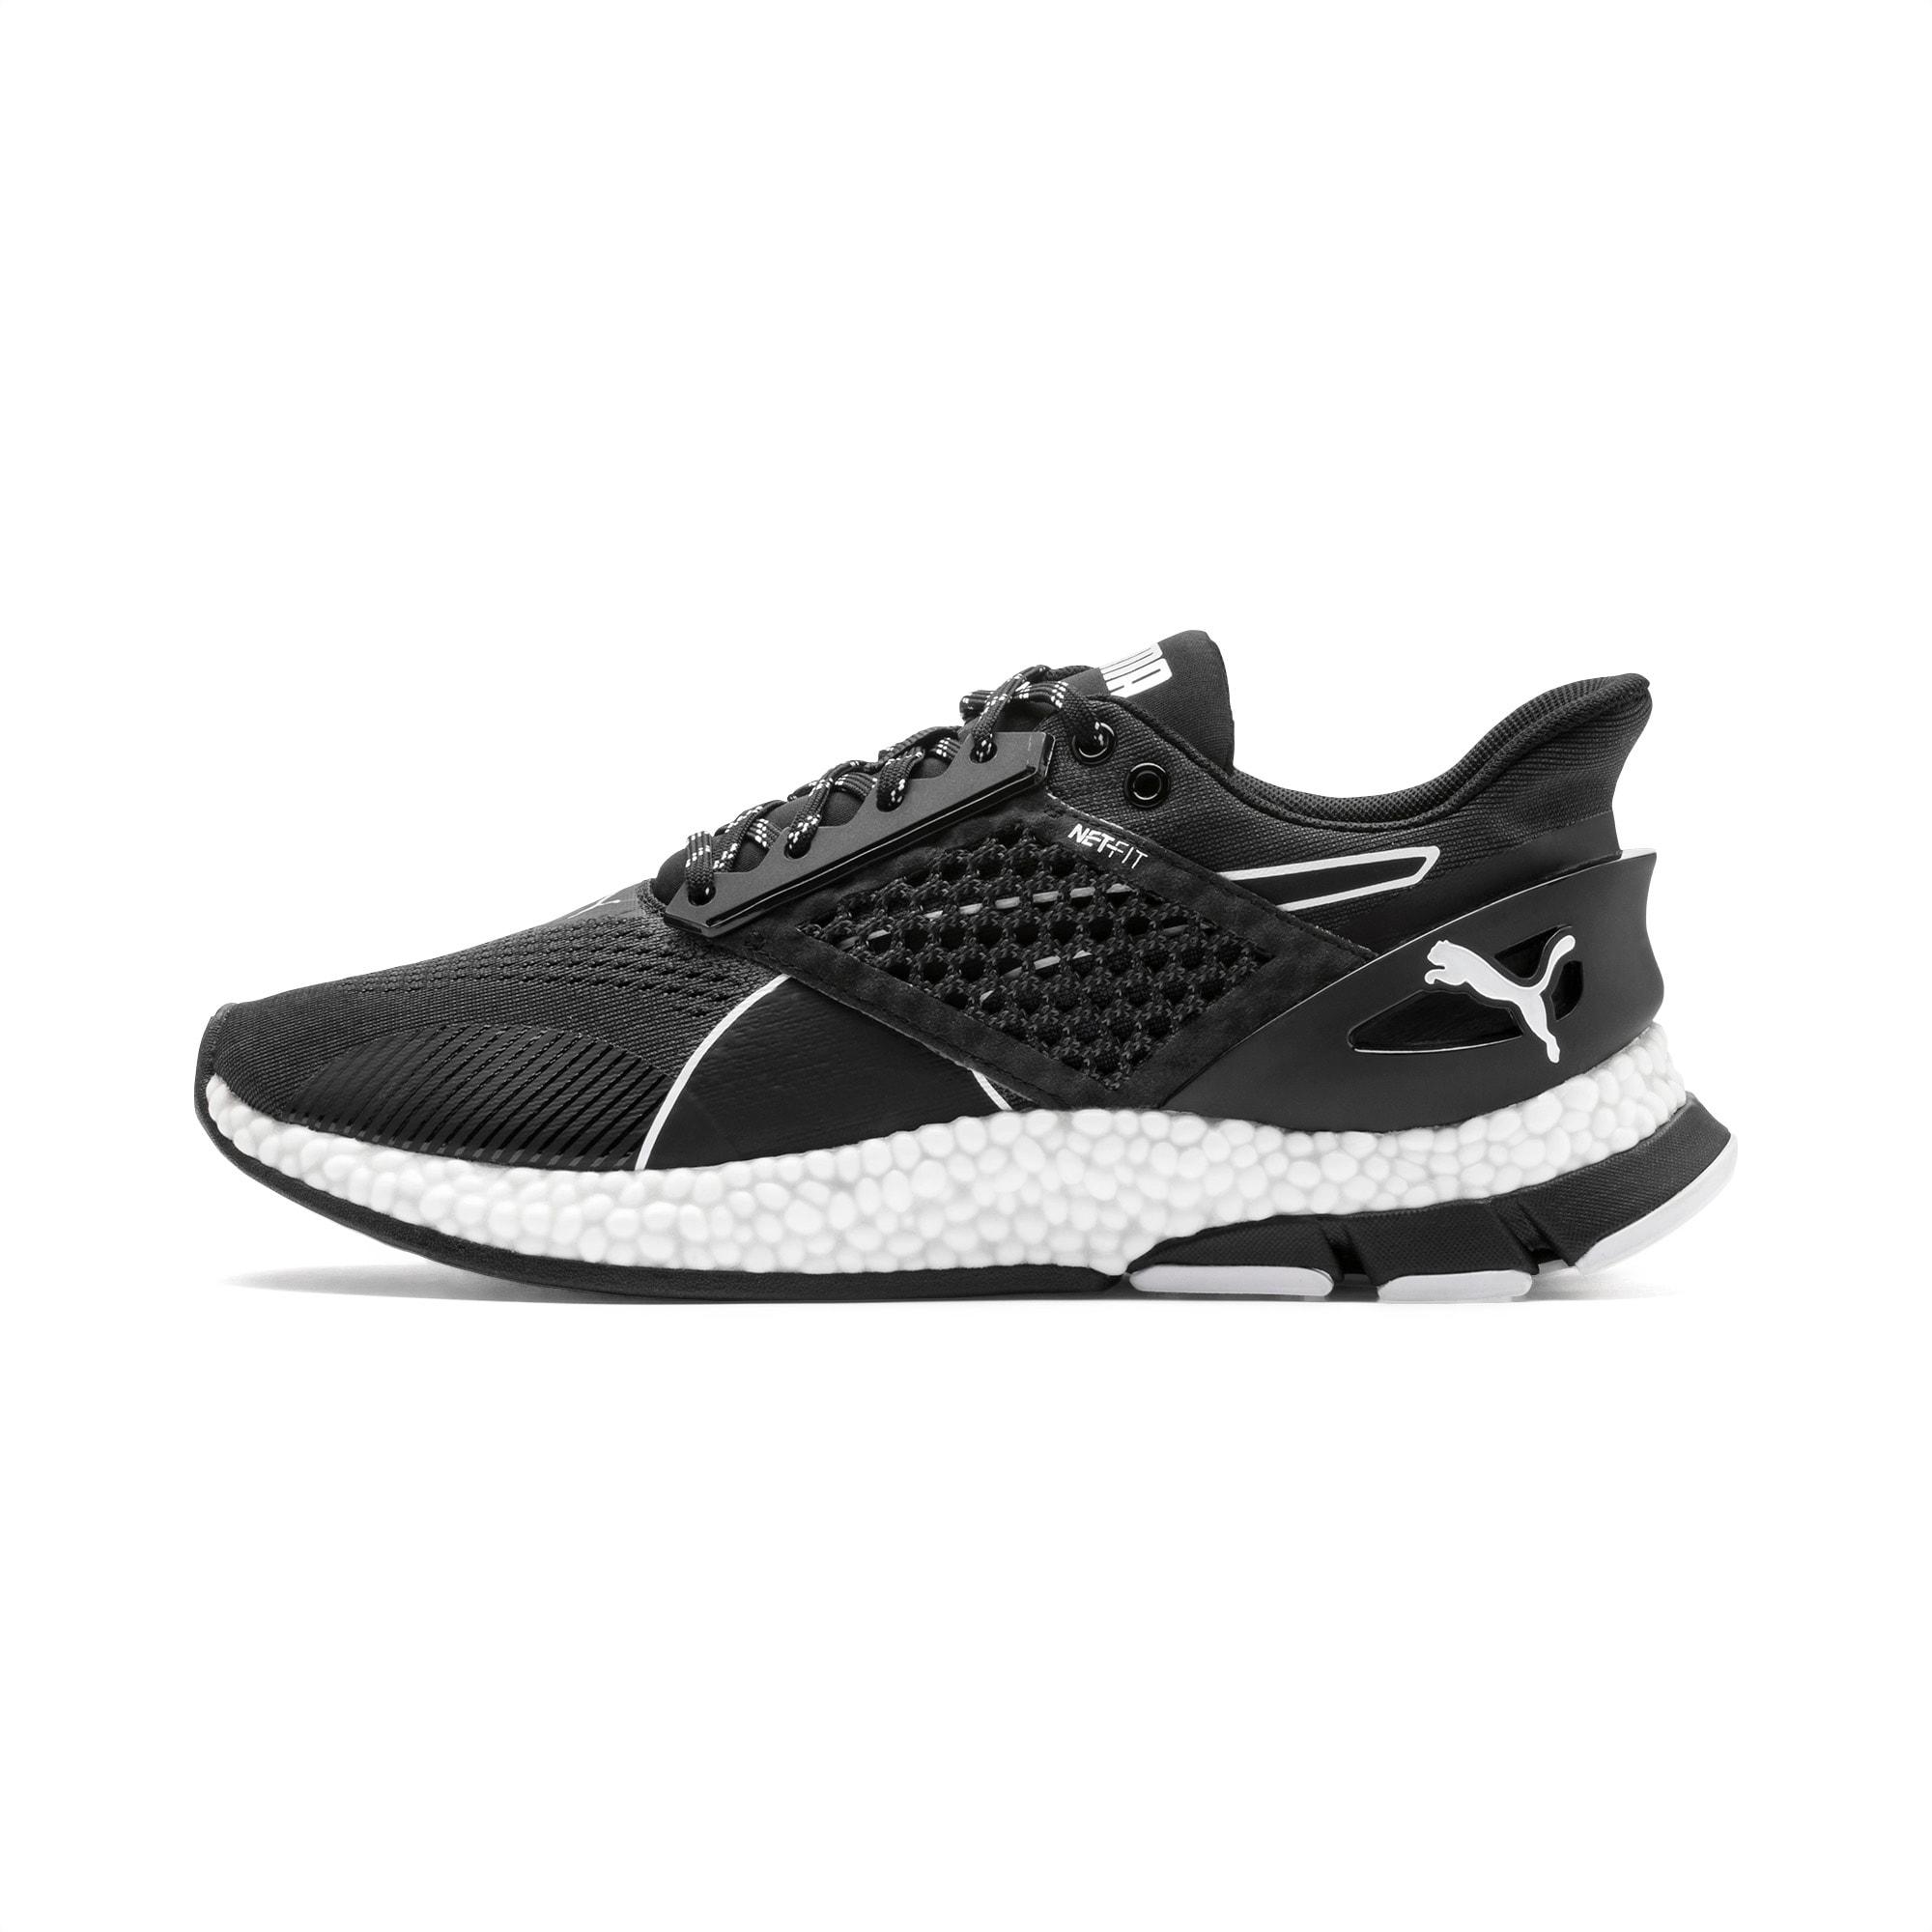 HYBRID Astro Men's Running Shoes | PUMA US